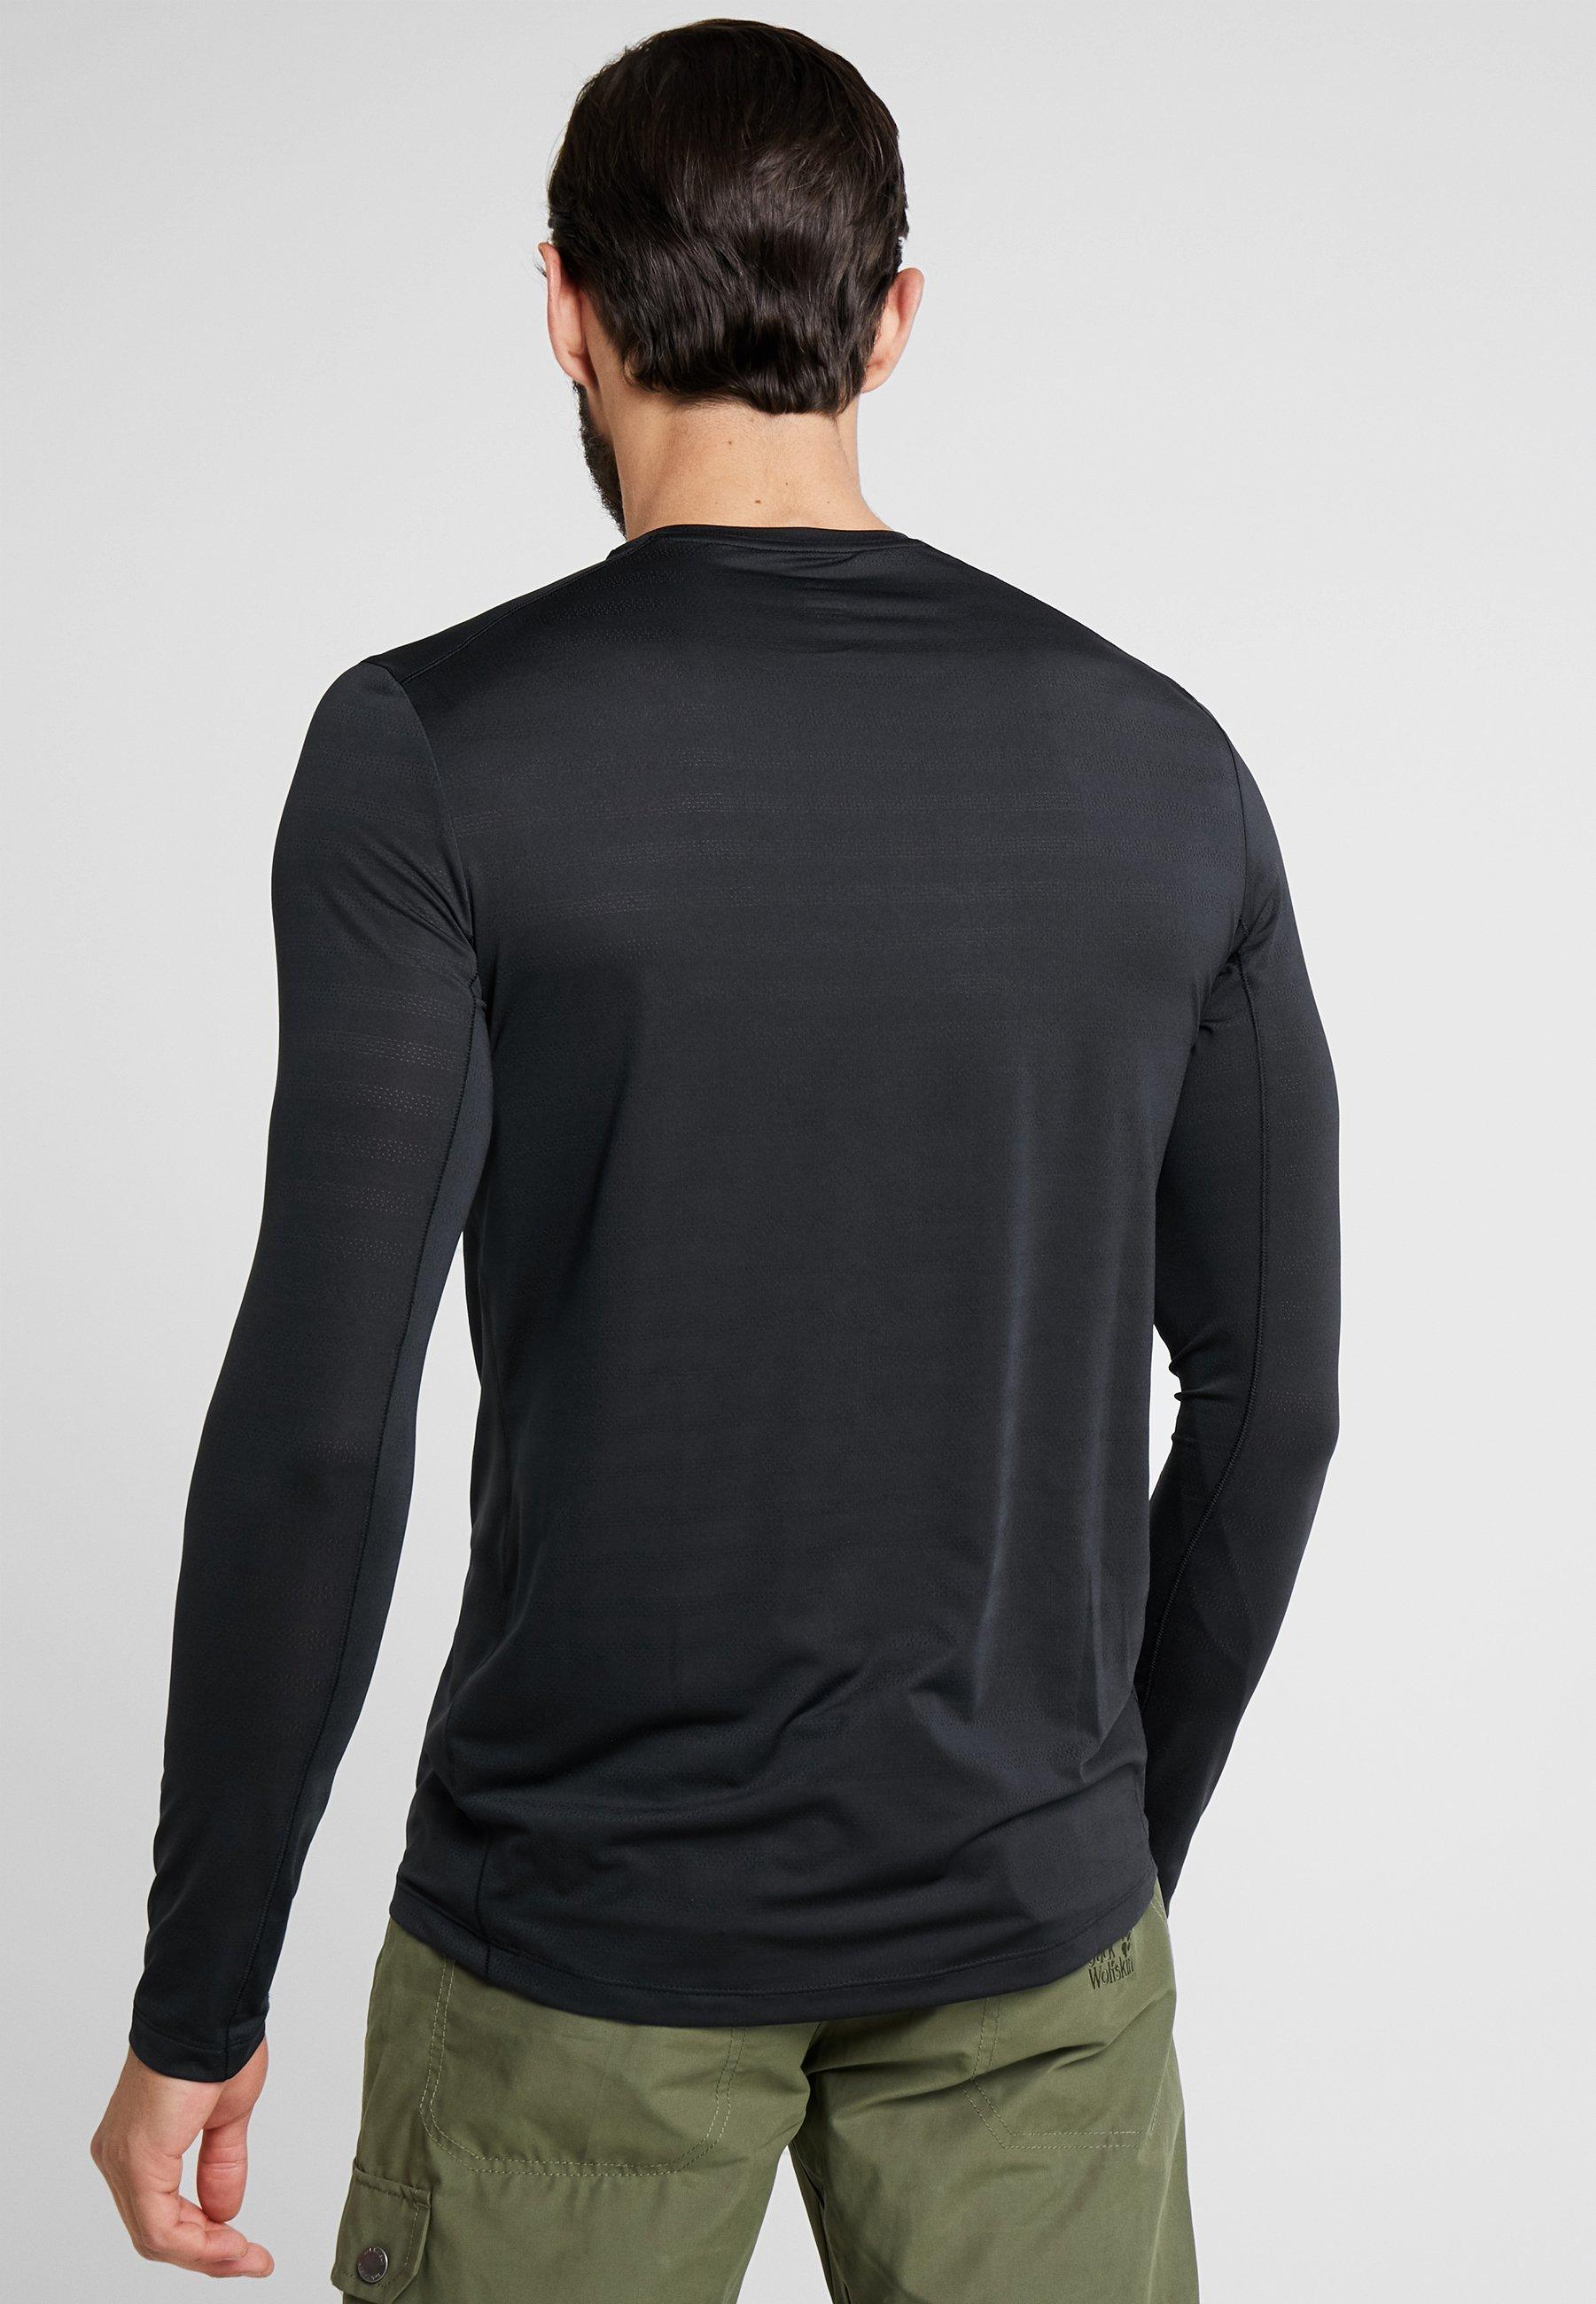 De Xa Sport TeeT Black shirt Salomon ZTPiuOkX